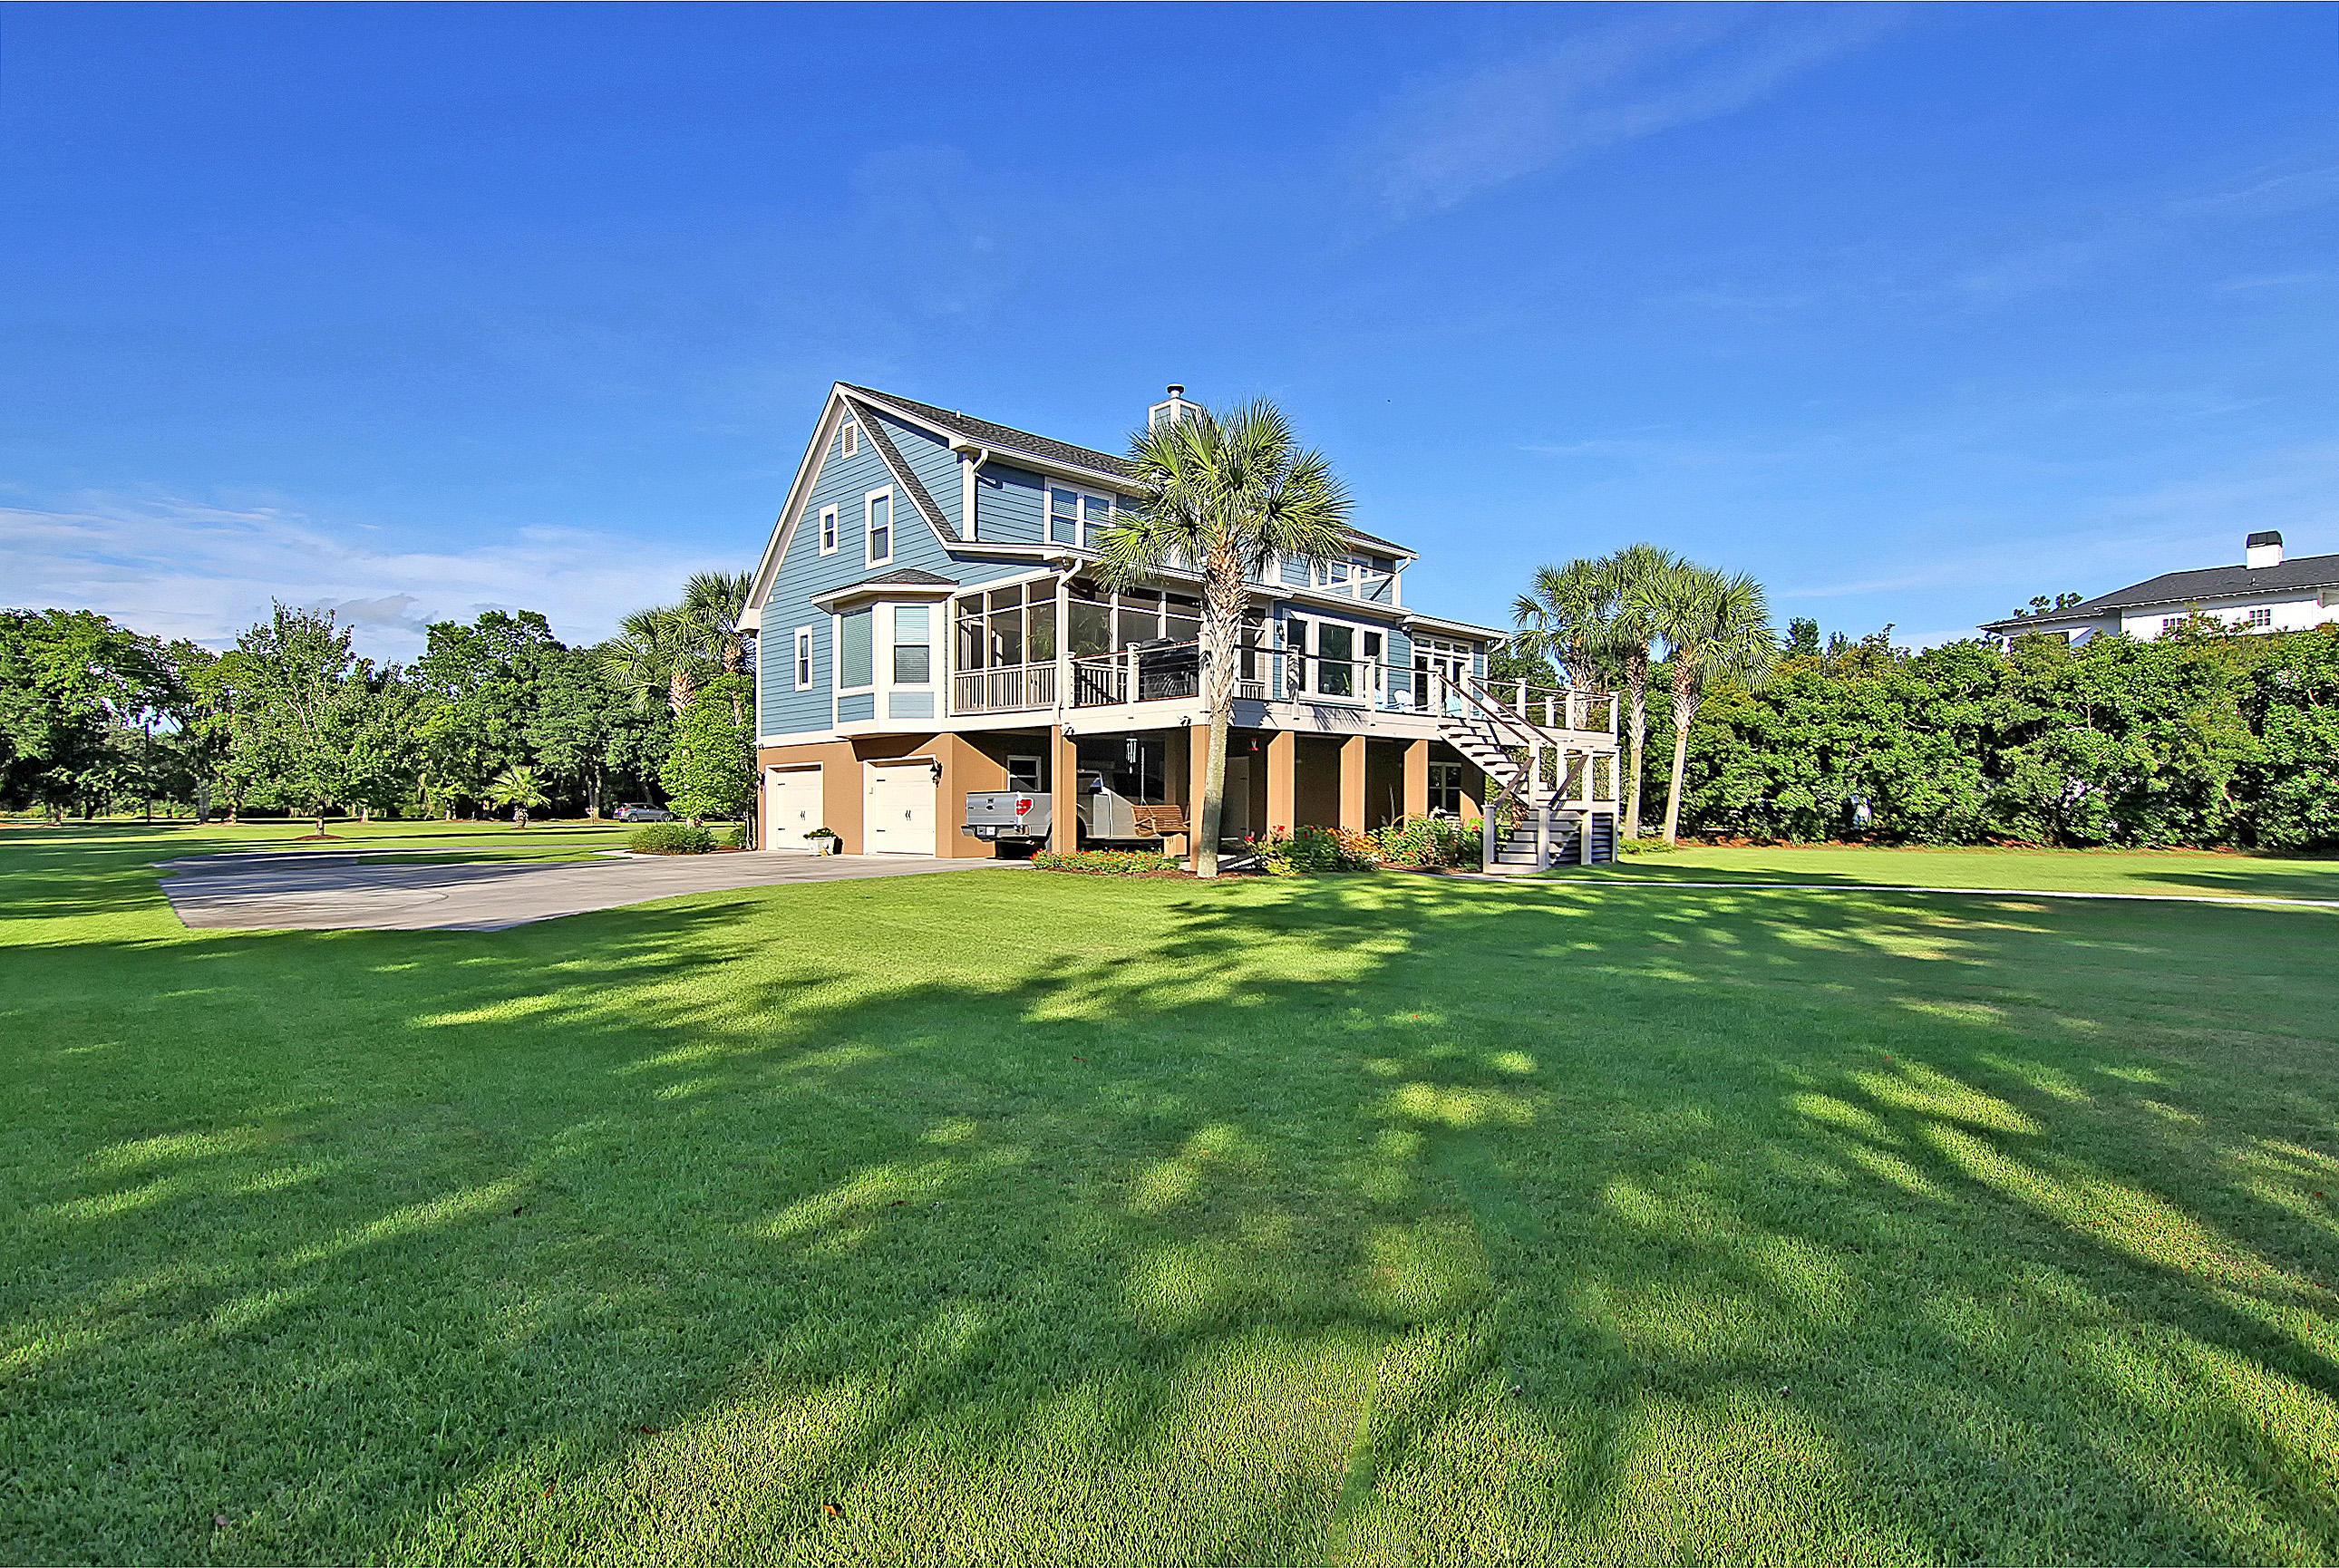 Archfield Plantation Homes For Sale - 4655 Archfield, Meggett, SC - 18